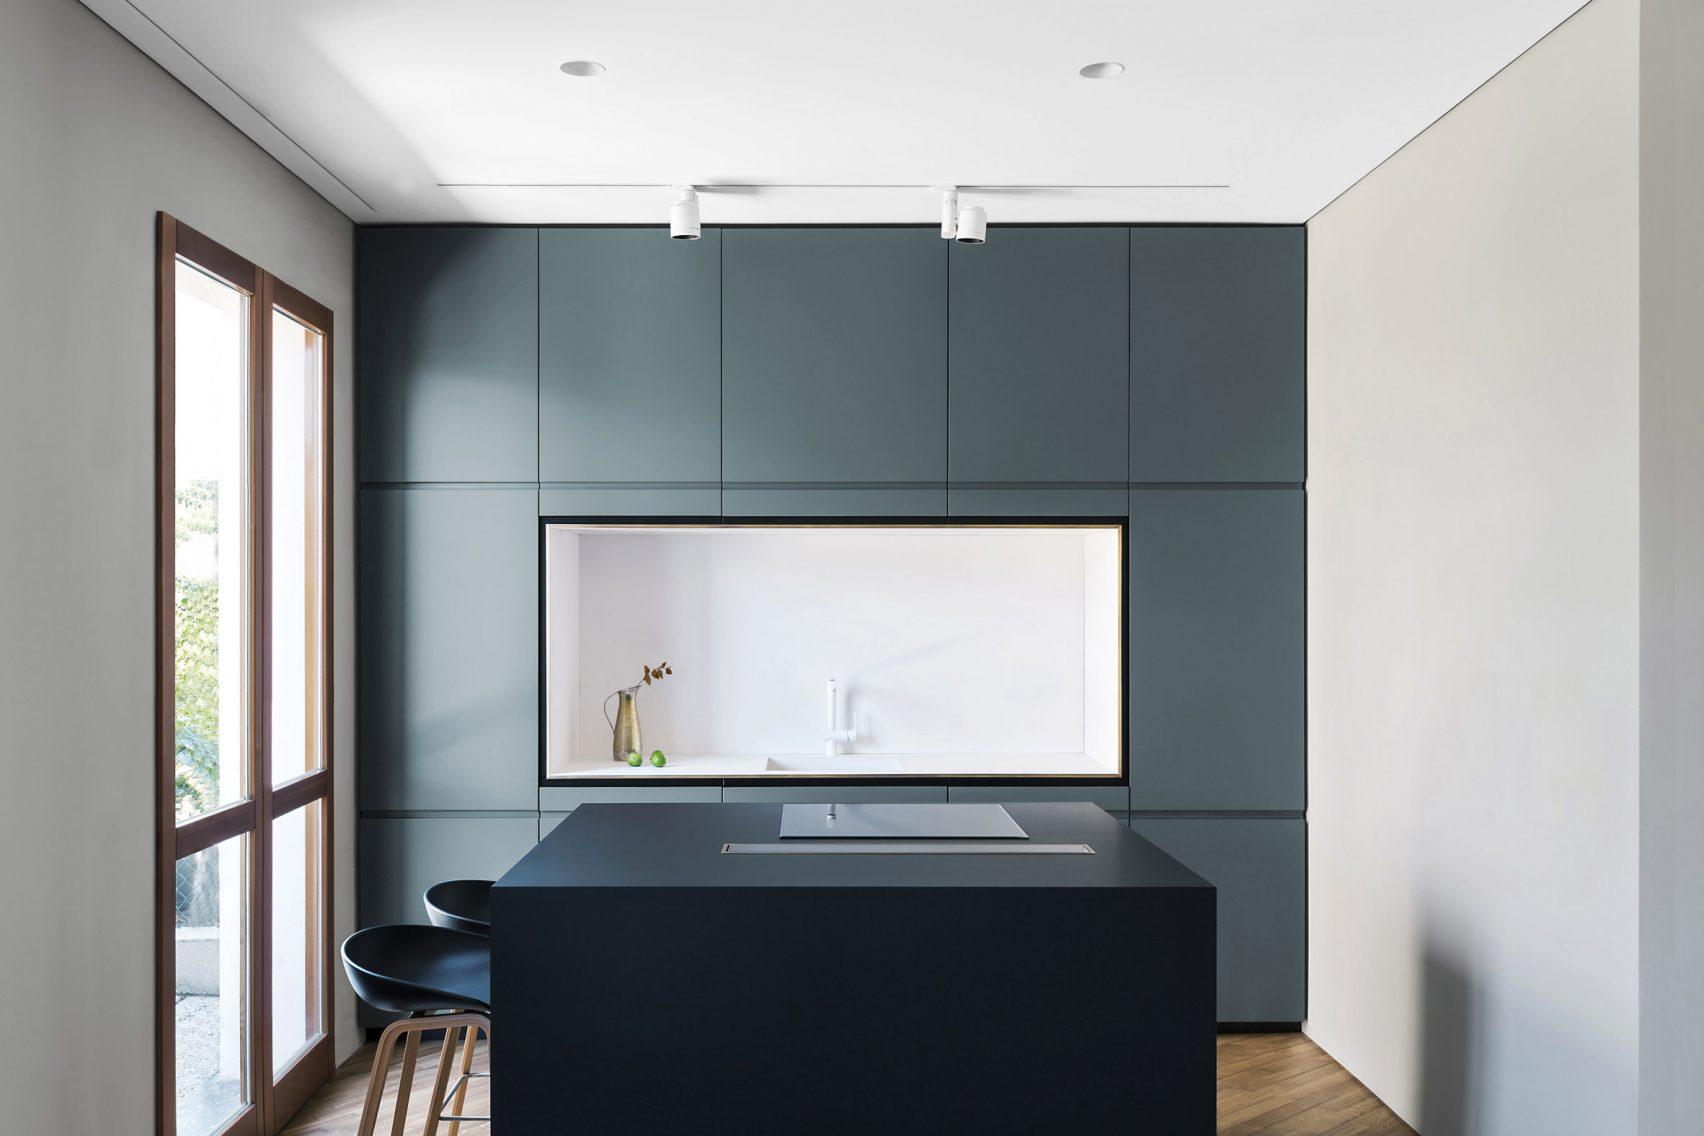 Keuken Moderne Zwart : Strakke moderne keuken met blauwe wandkast en zwart kookeiland